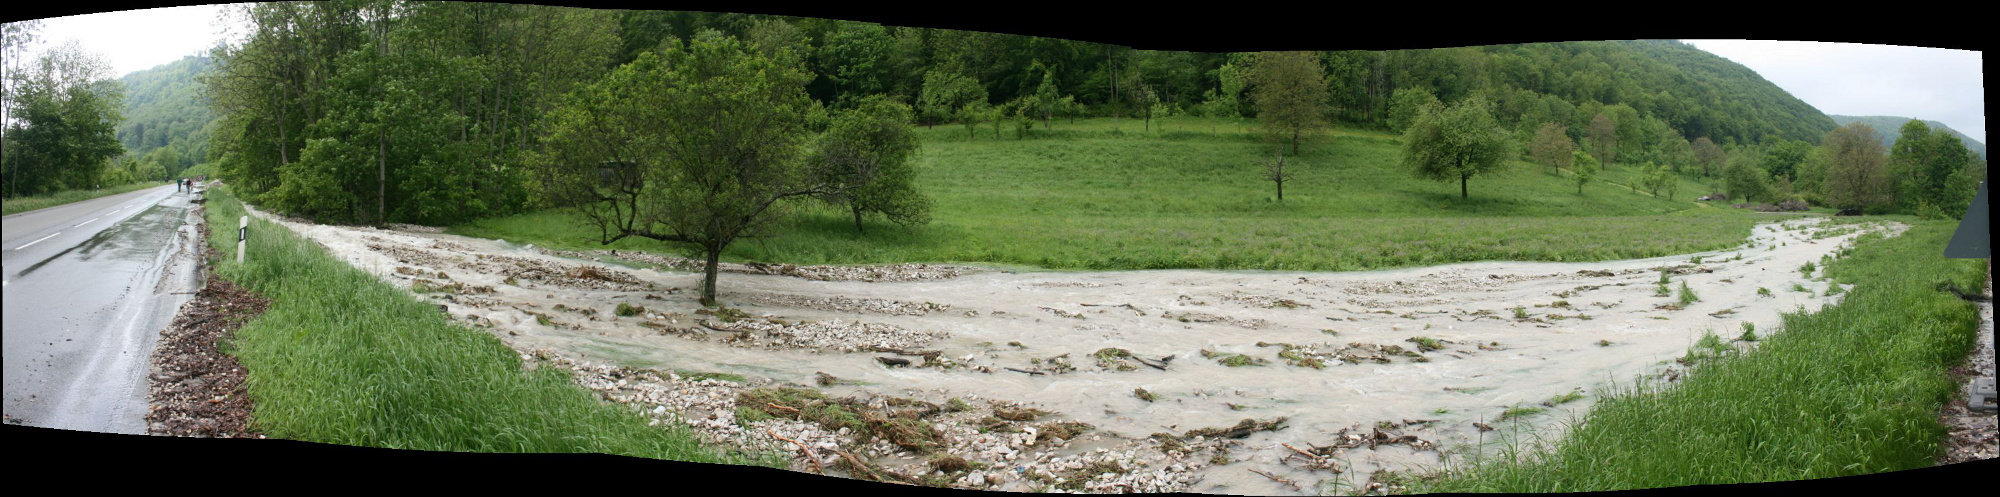 brunnensteinfluss-vormittags-tewje-mehner